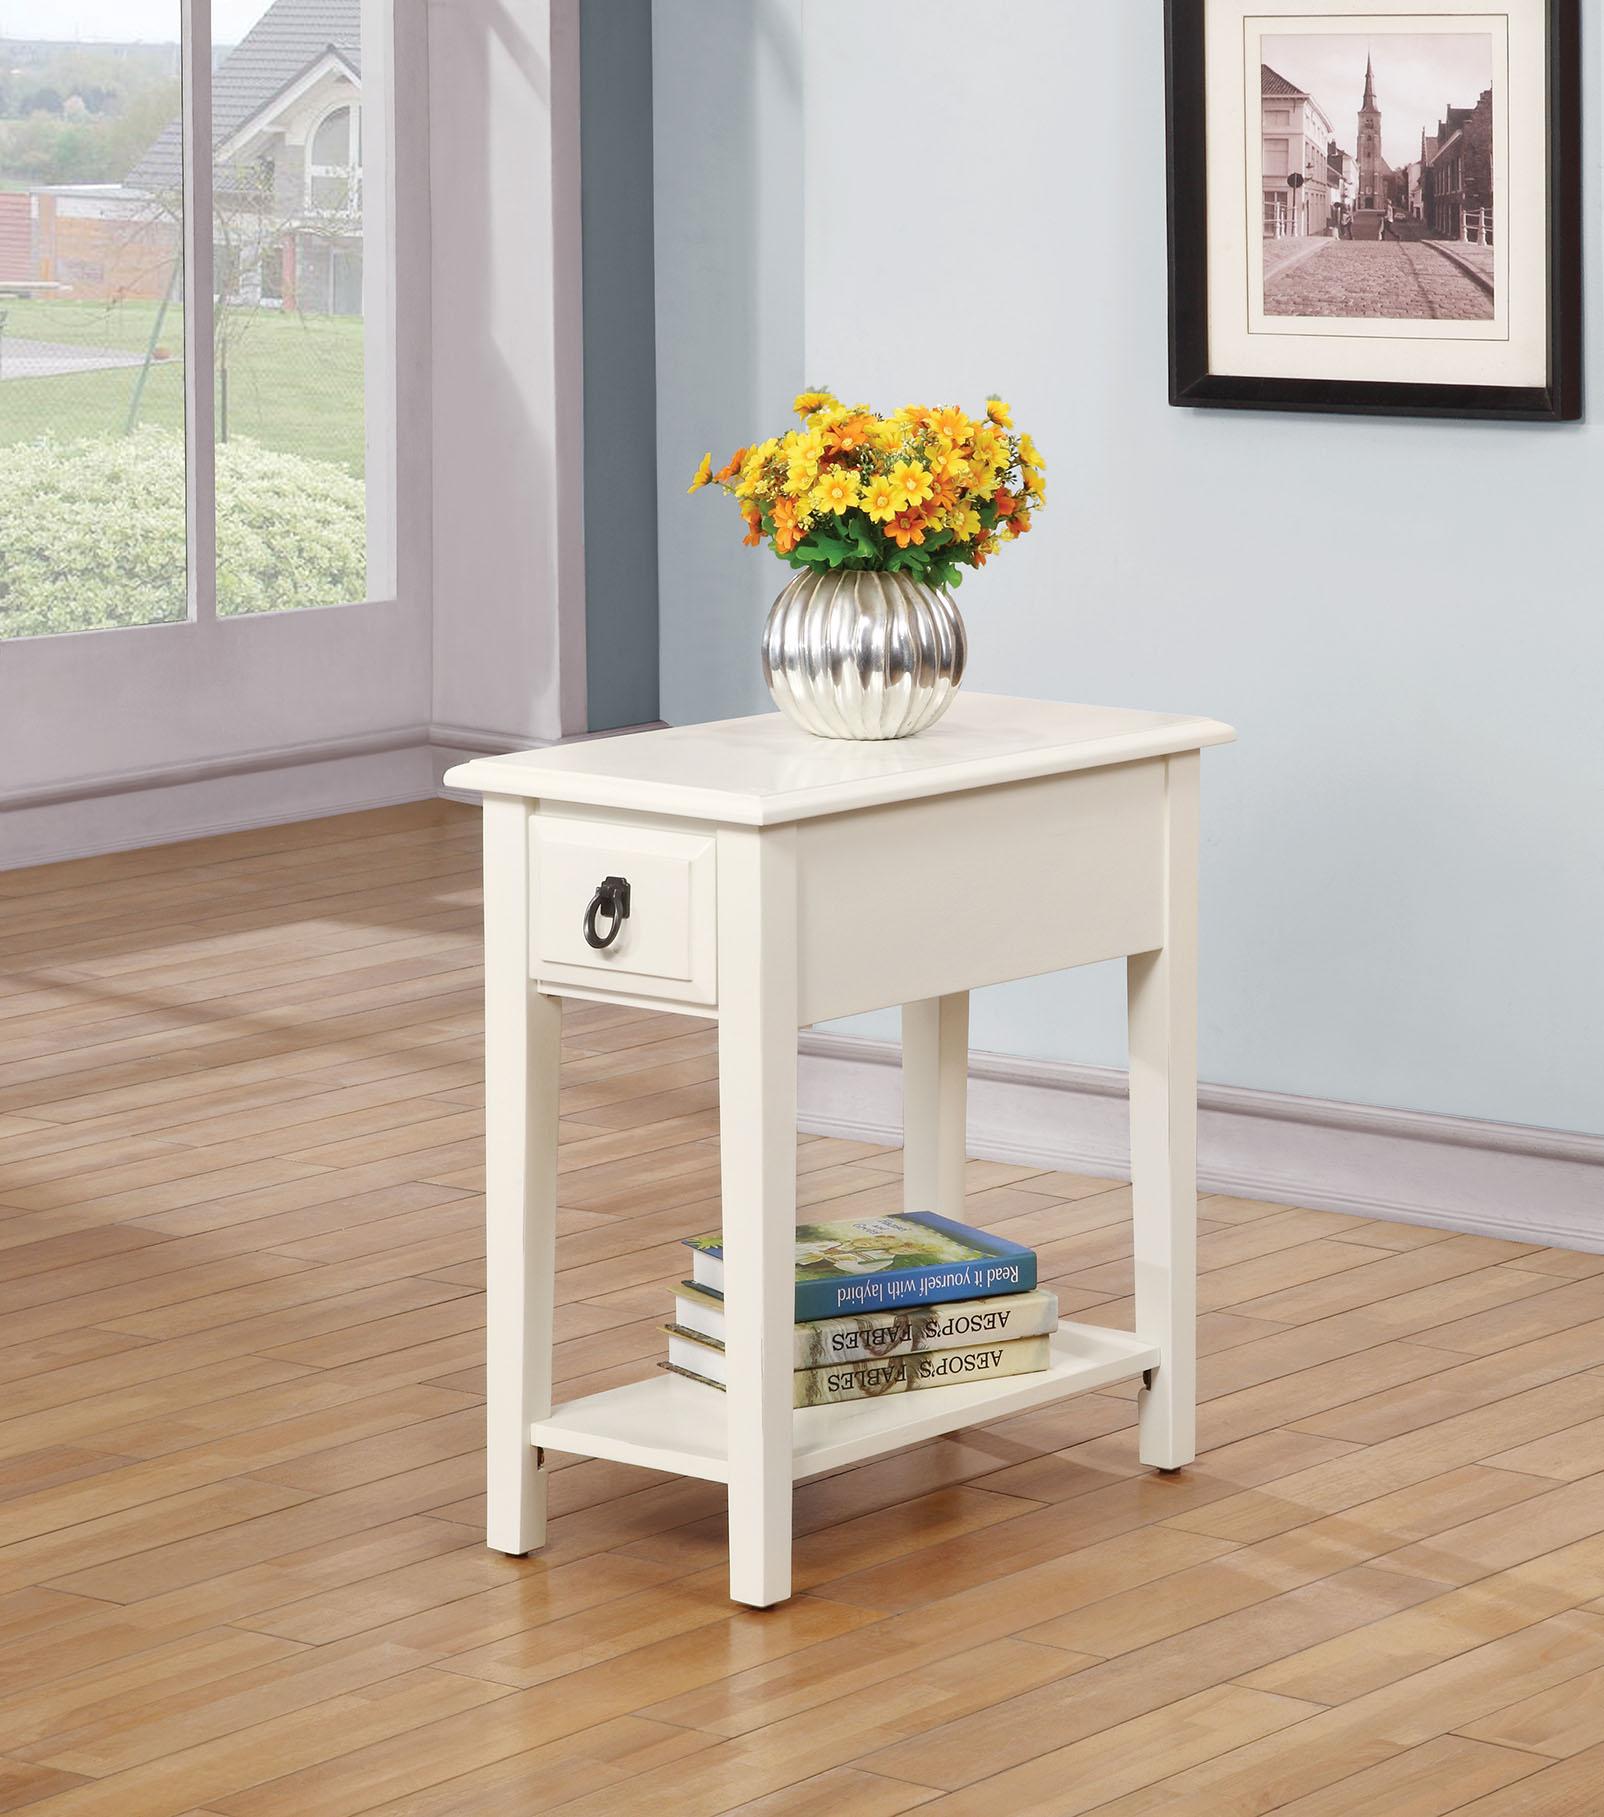 Homeroots furnitureside table white rubber wood ash veneer whitewhite walmart com